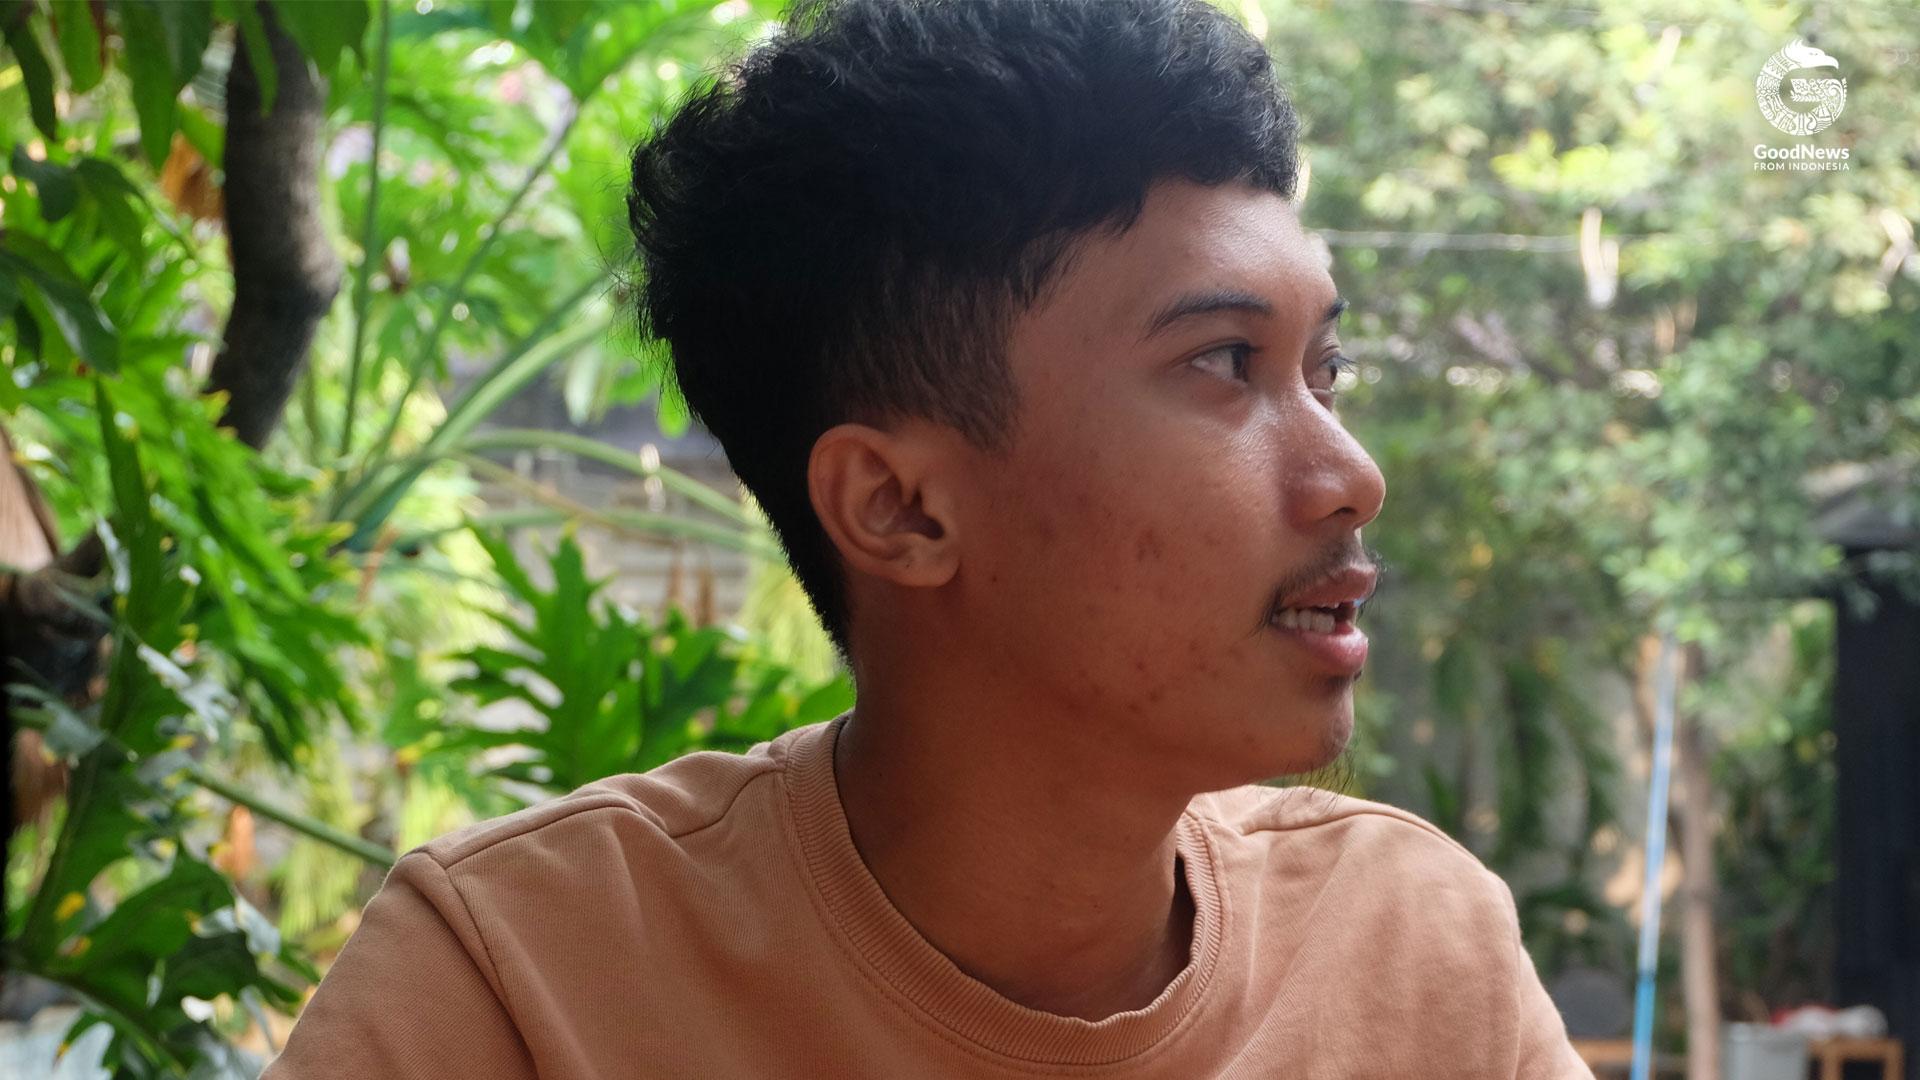 Nurfadli menceritakan proses kerjanya di tempat produksi Tahilalats di kawasan Jakarta Selatan | Foto: Aditya Jaya Iswara/GNFI